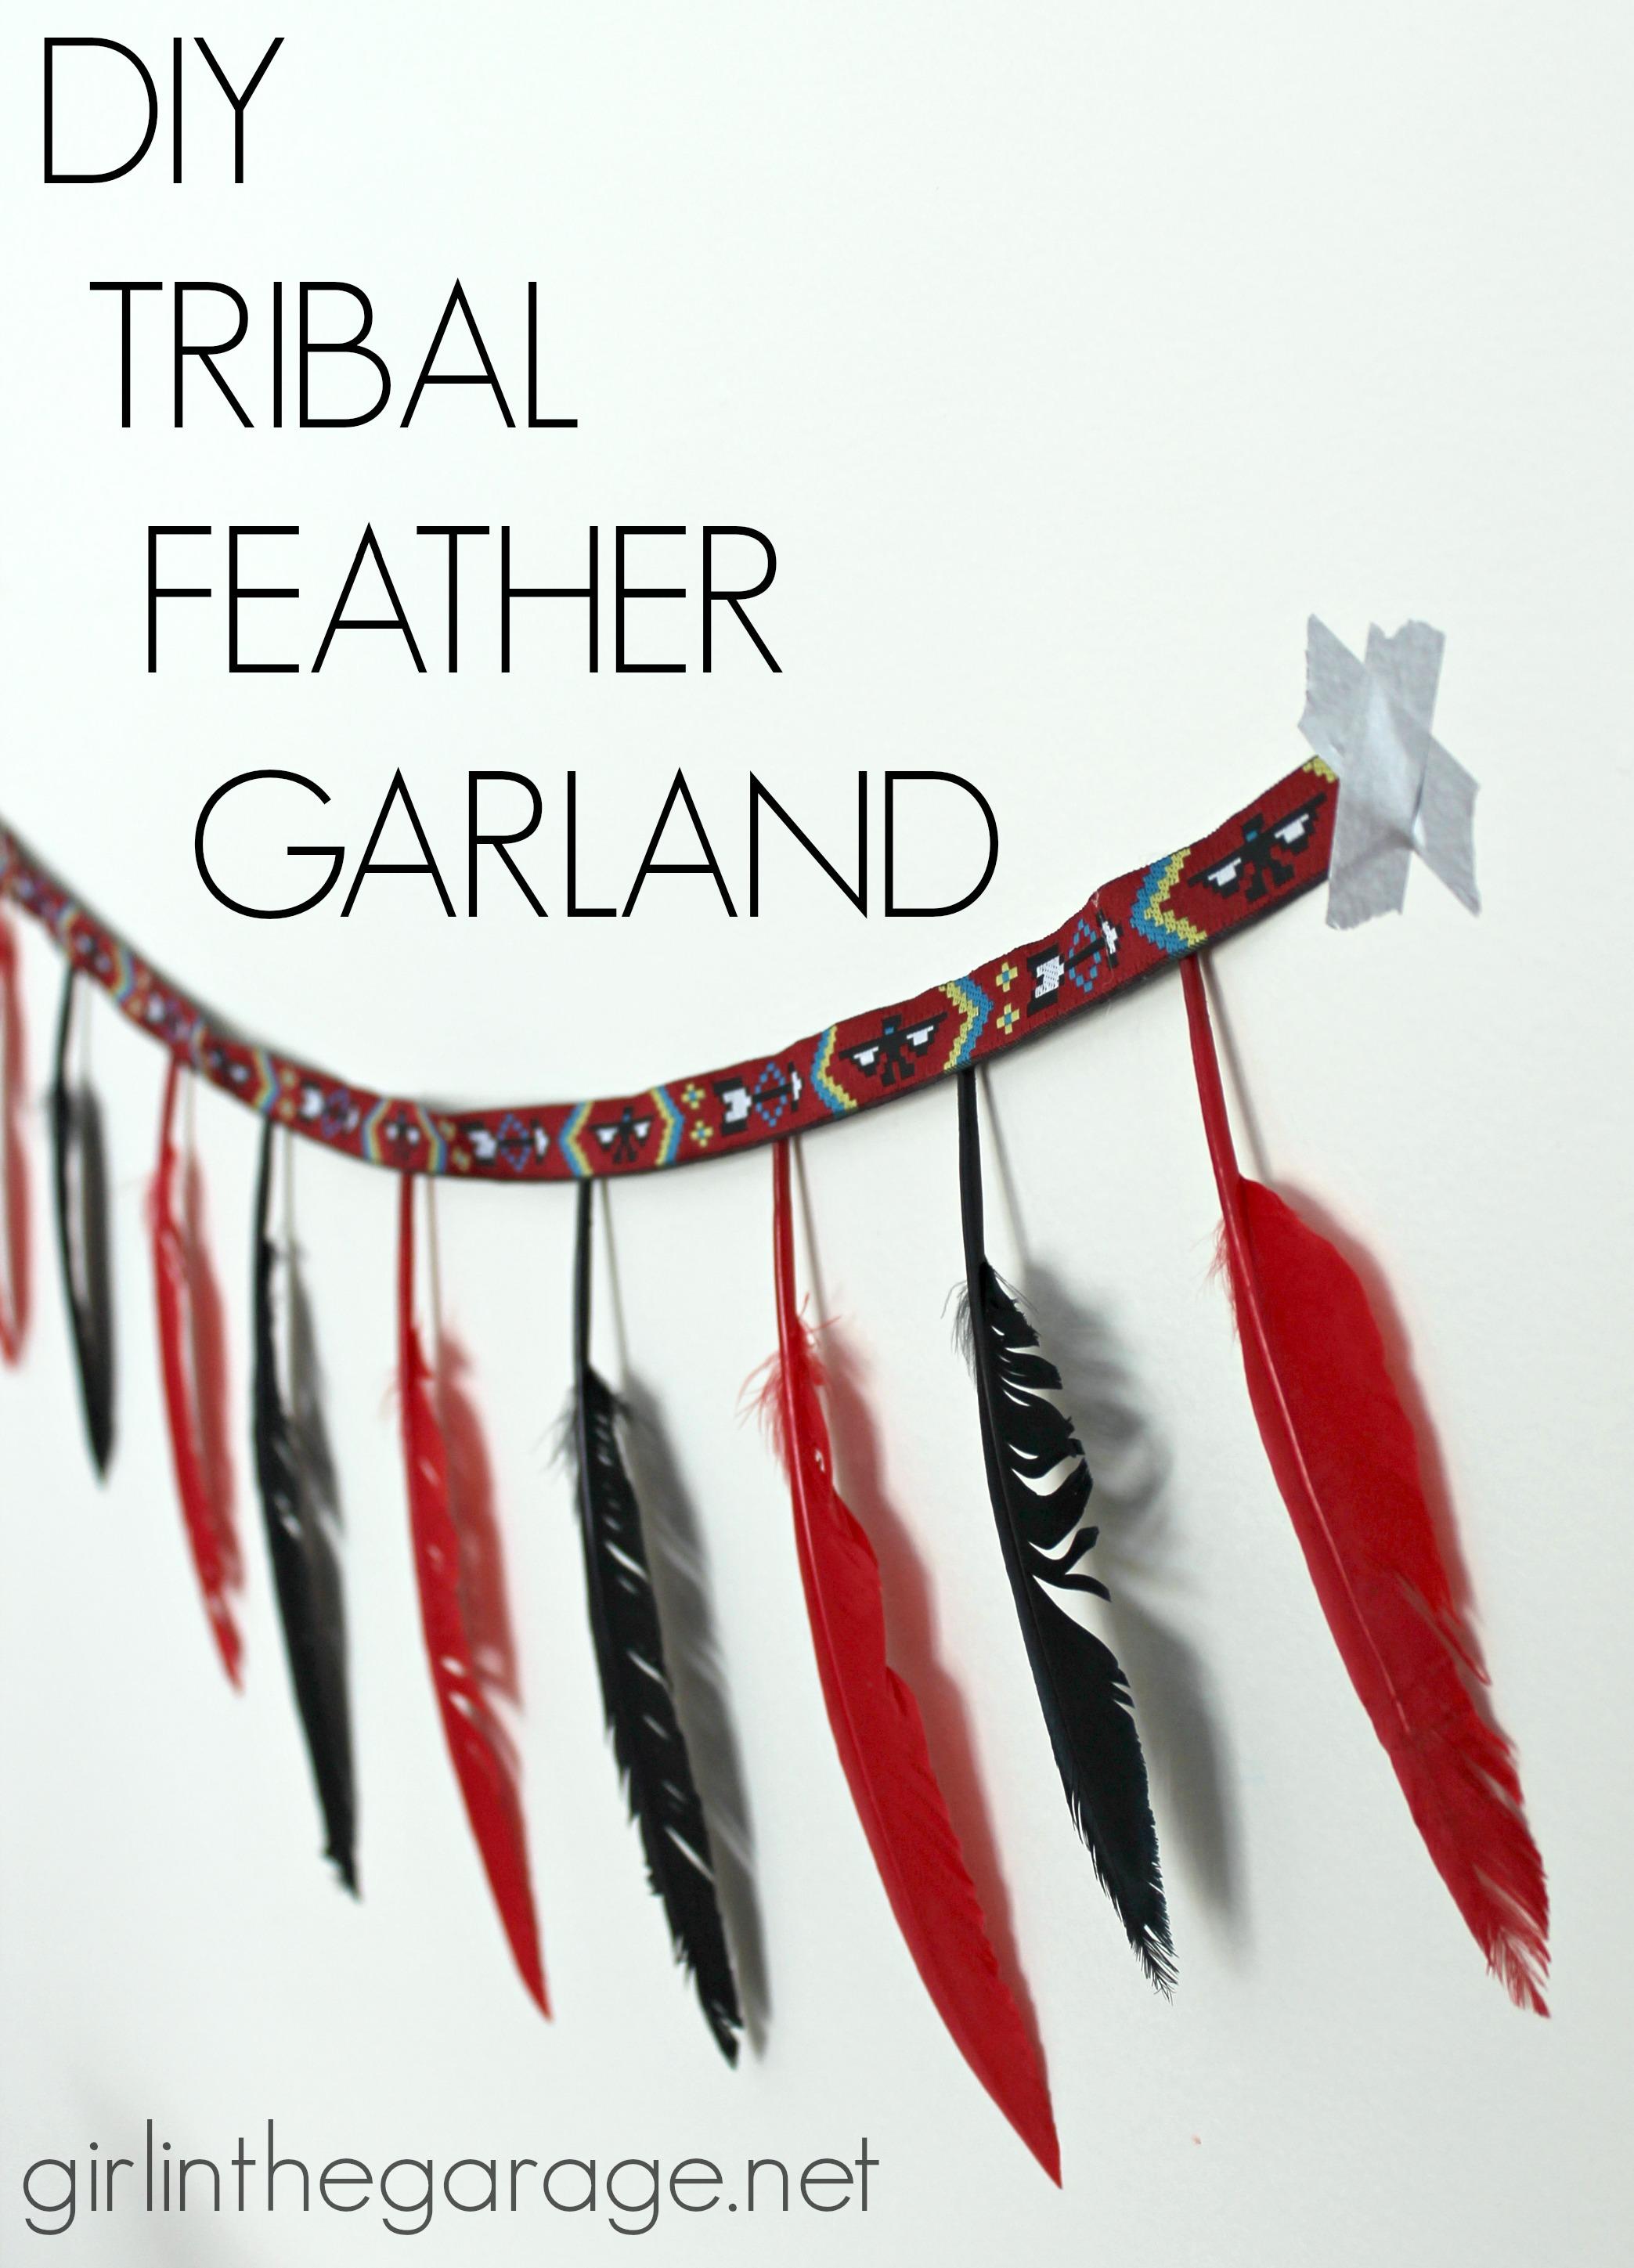 DIY Tribal Feather Garland | Girl in the Garage®